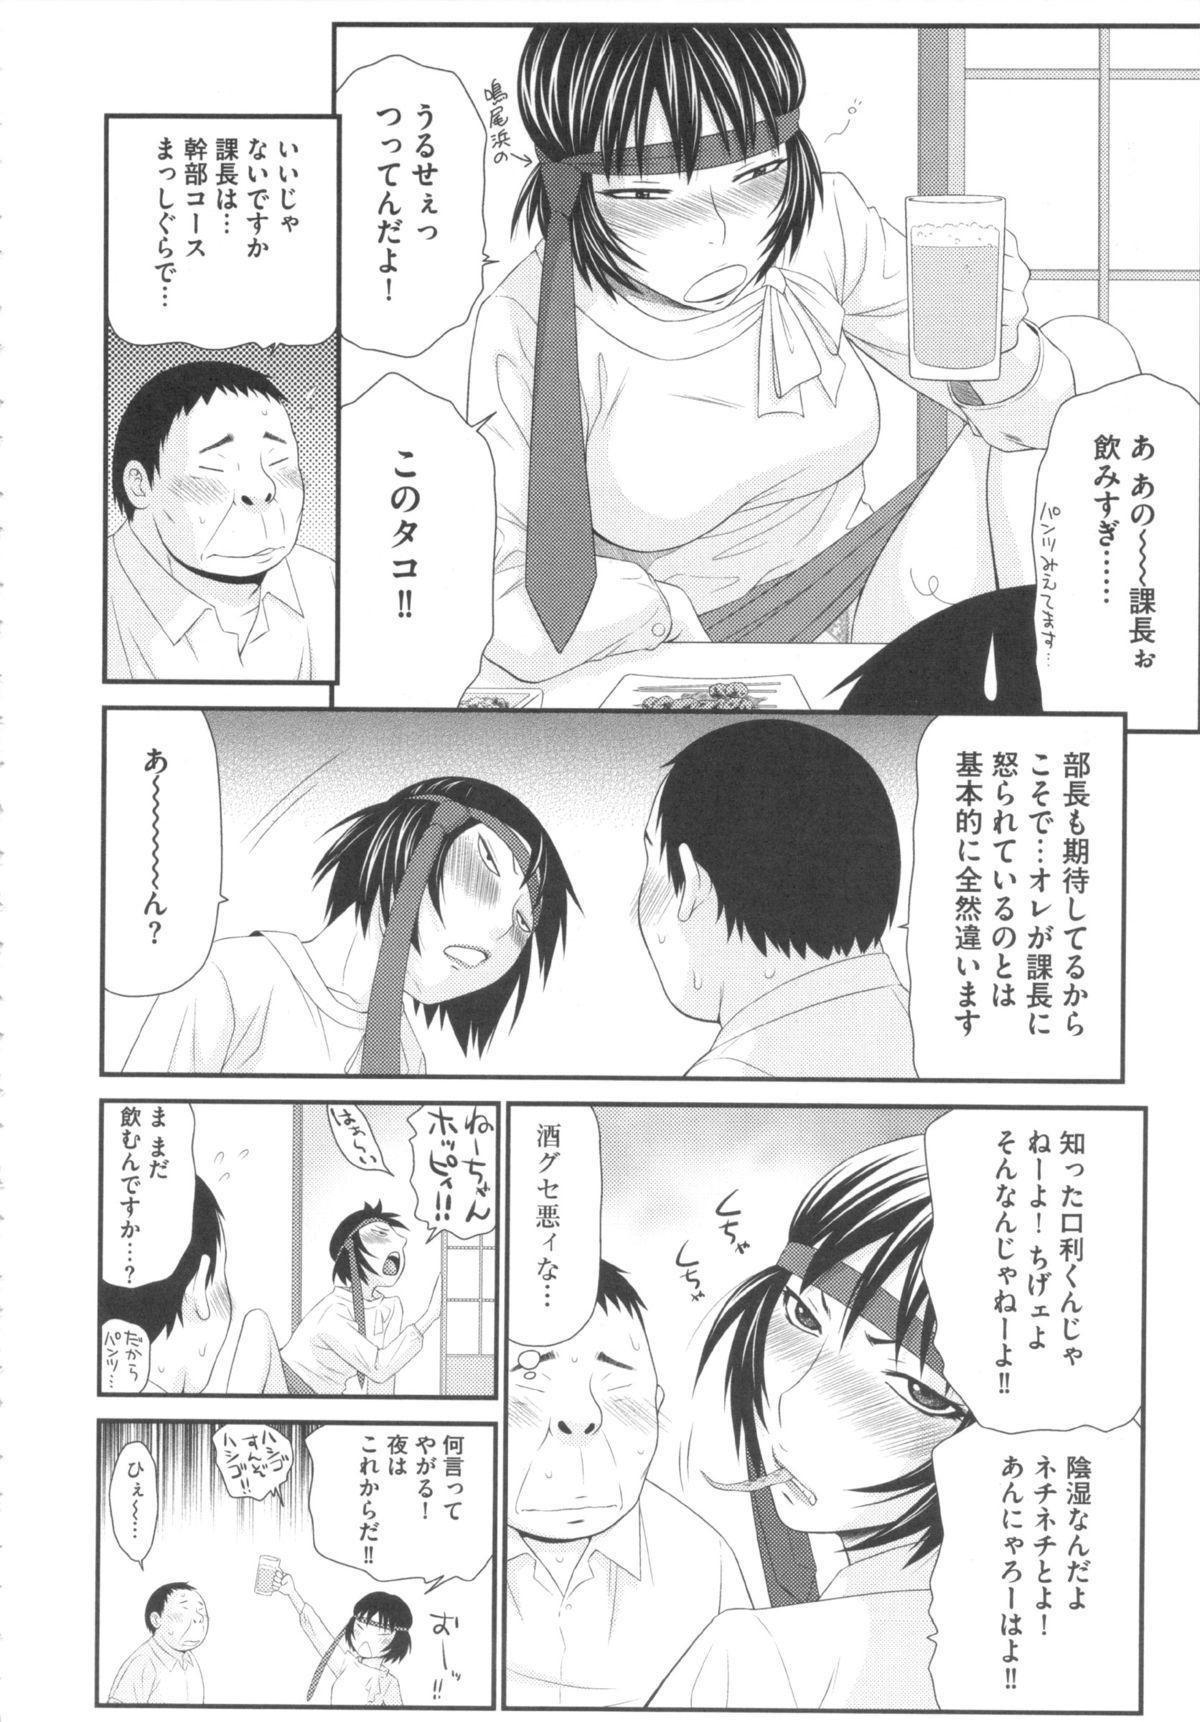 Kiseki No Zaajiru - Sperm of Miracle 108